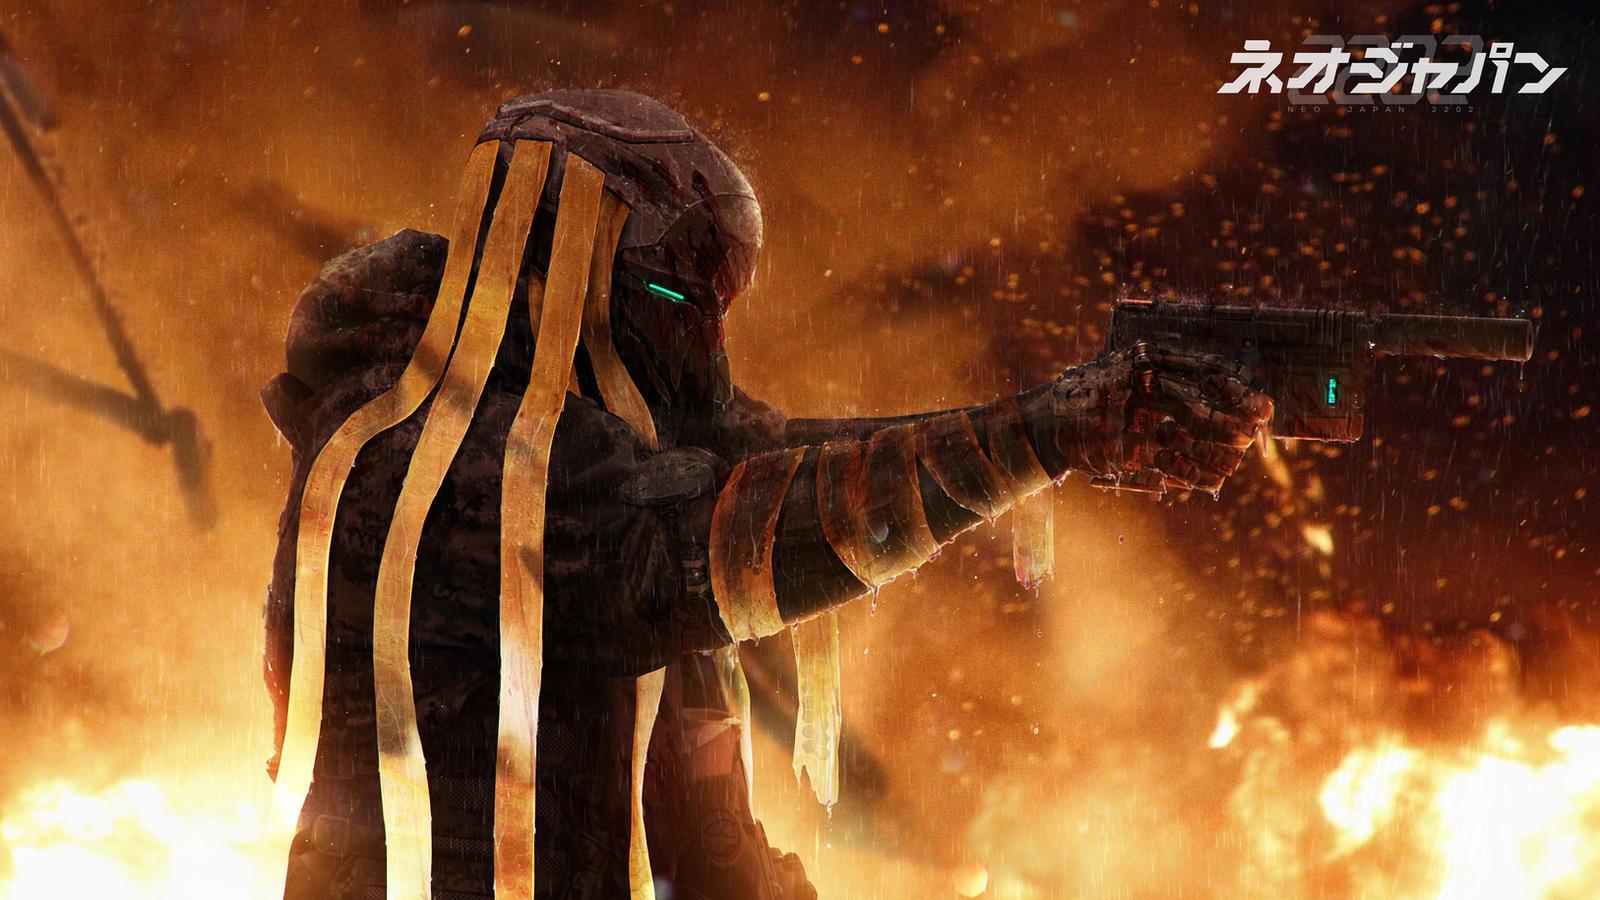 Neo Japan 2202 - Phantom confrontation by johnsonting